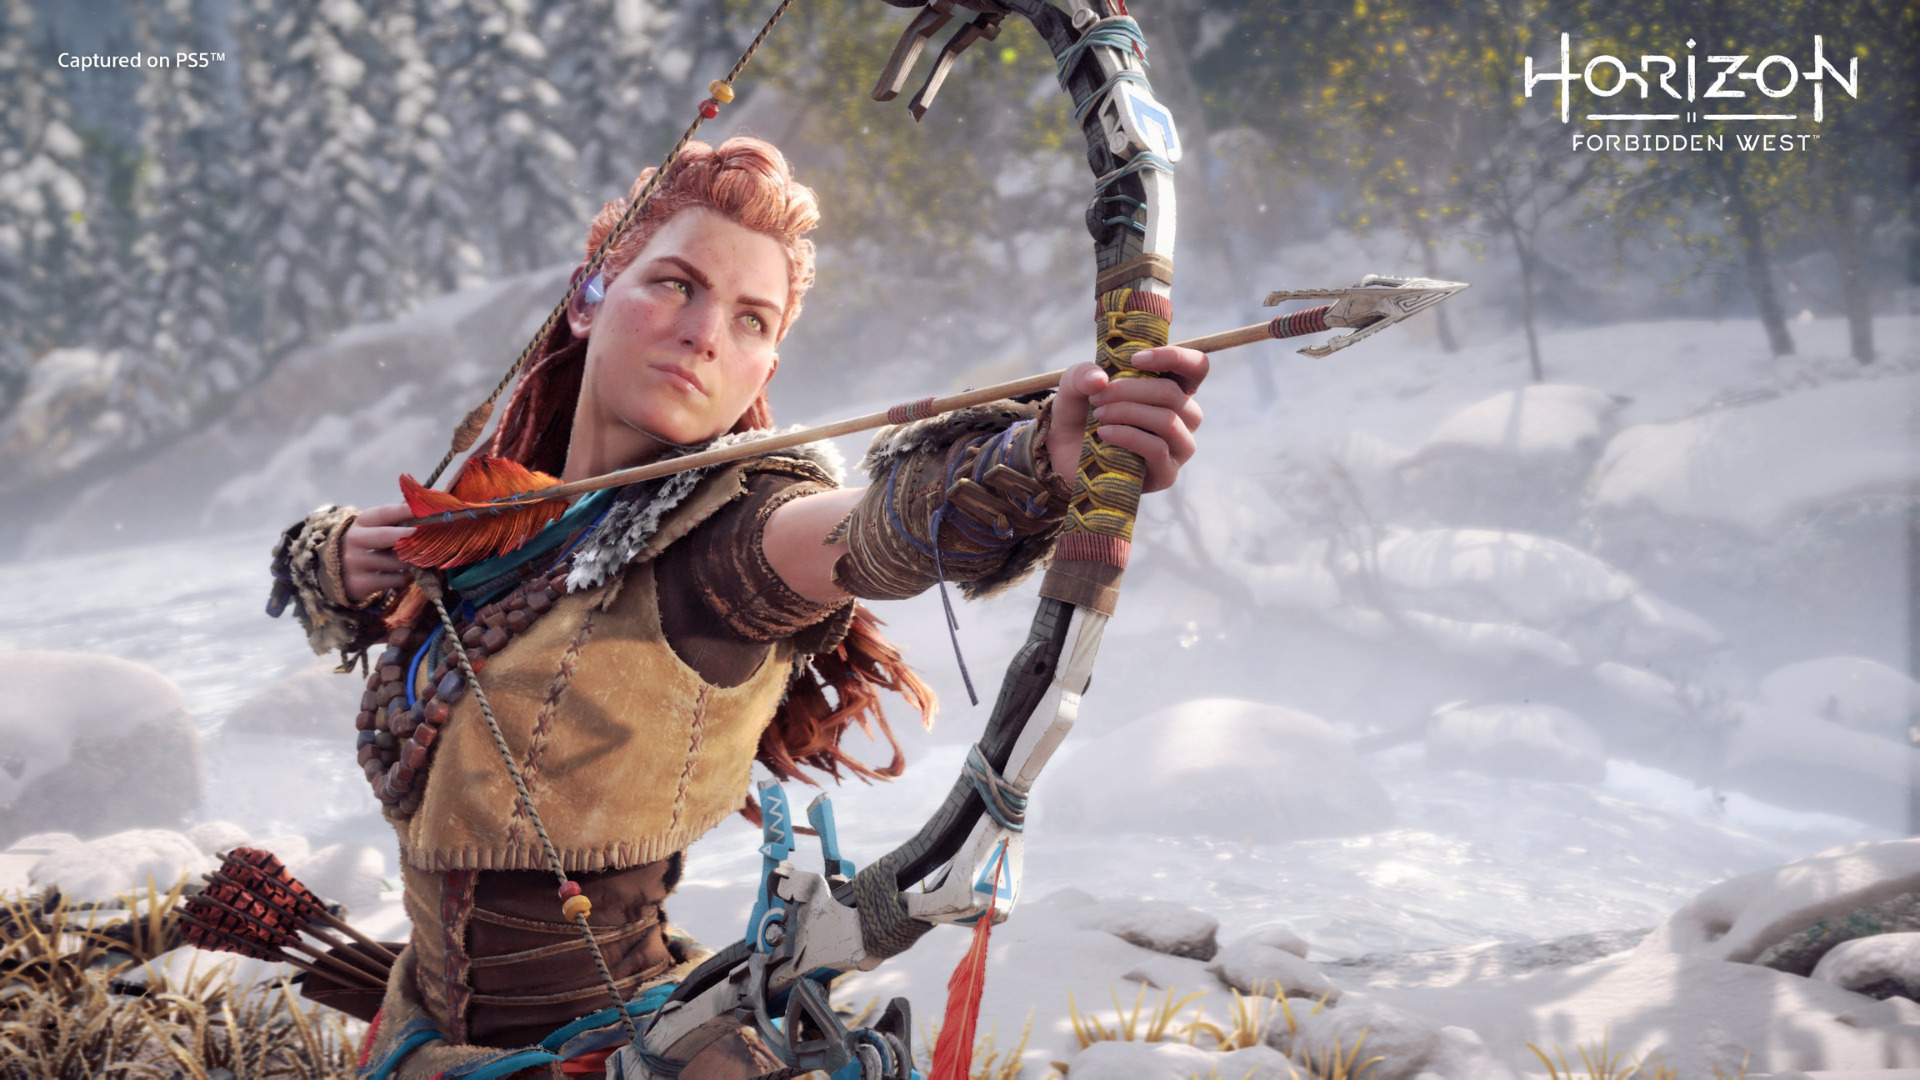 Horizon Forbidden West gameplay screenshot